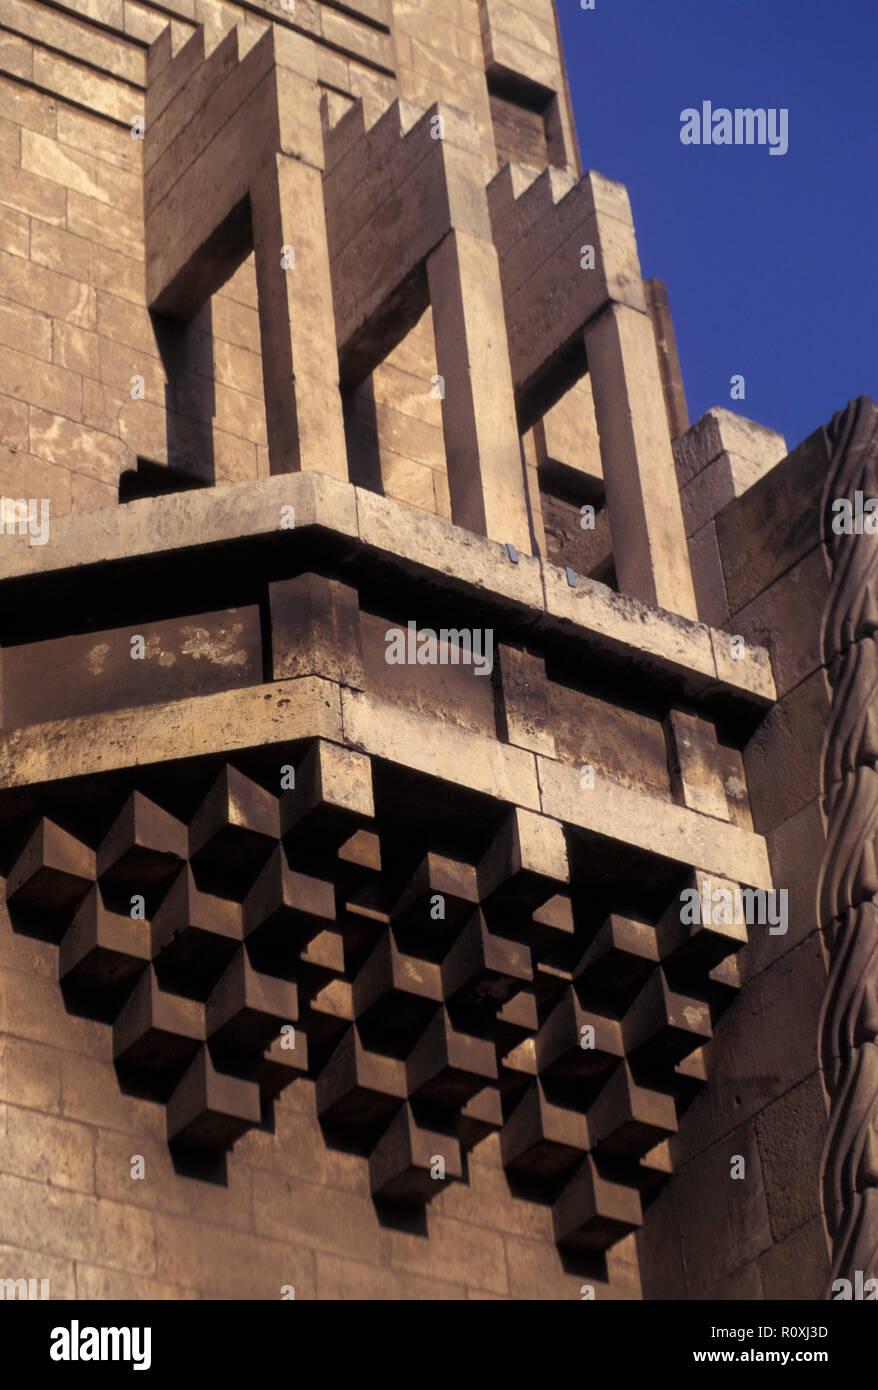 NOT_1128807 SPAIN BARCELONA Sagrada Familia designed by Catalan architect Antoni Gaudí (1852–1926) - Stock Image